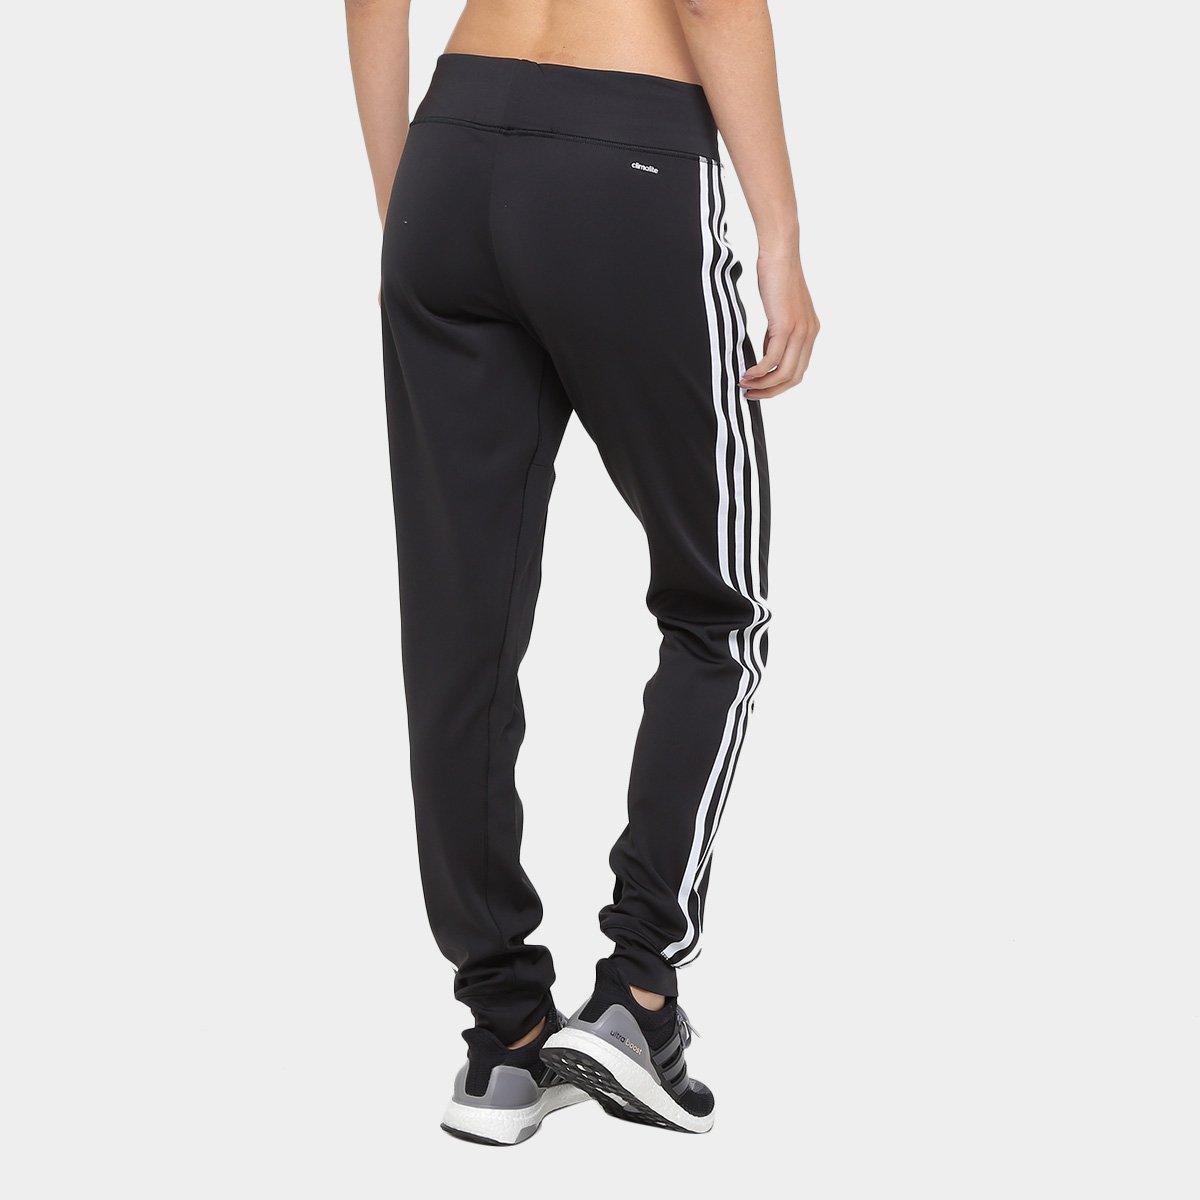 Calça Adidas M2M Cuff 3S Feminina - Compre Agora  707ac958c95